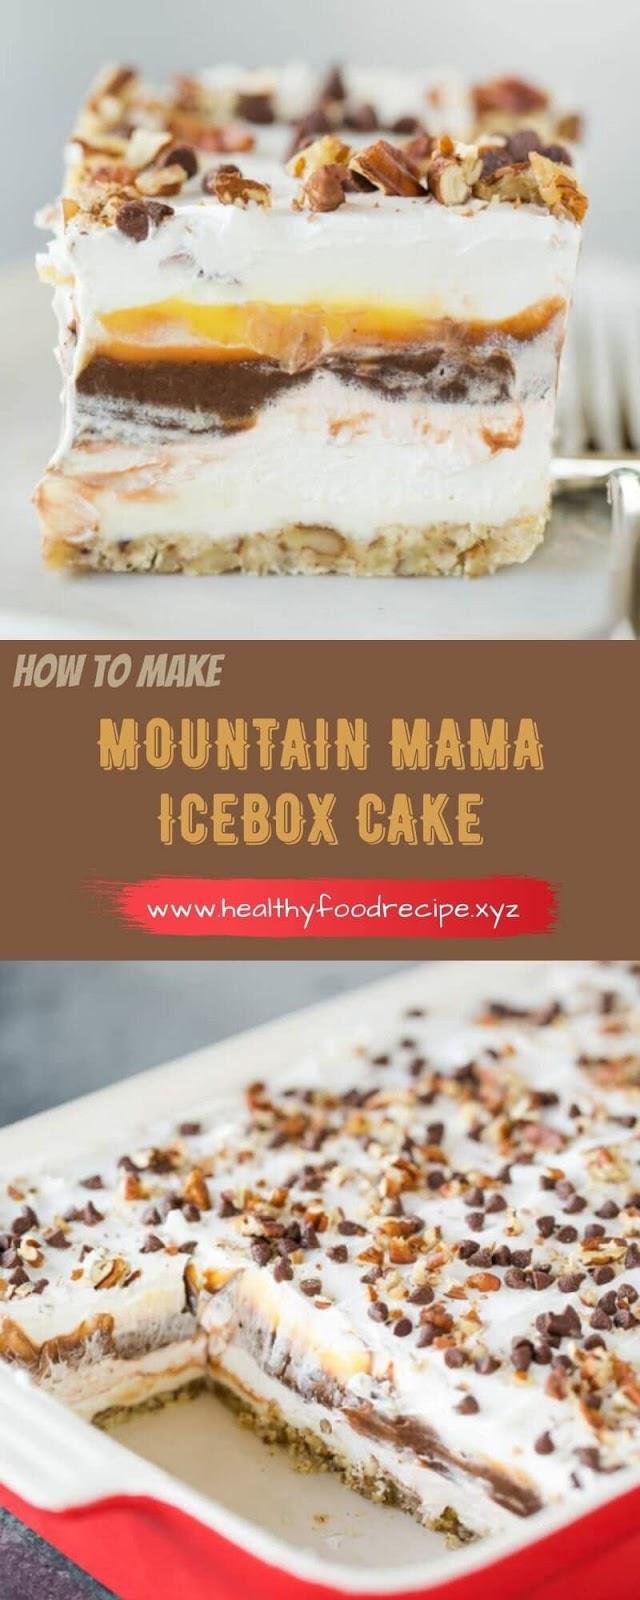 MOUNTAIN MAMA ICEBOX CAKE